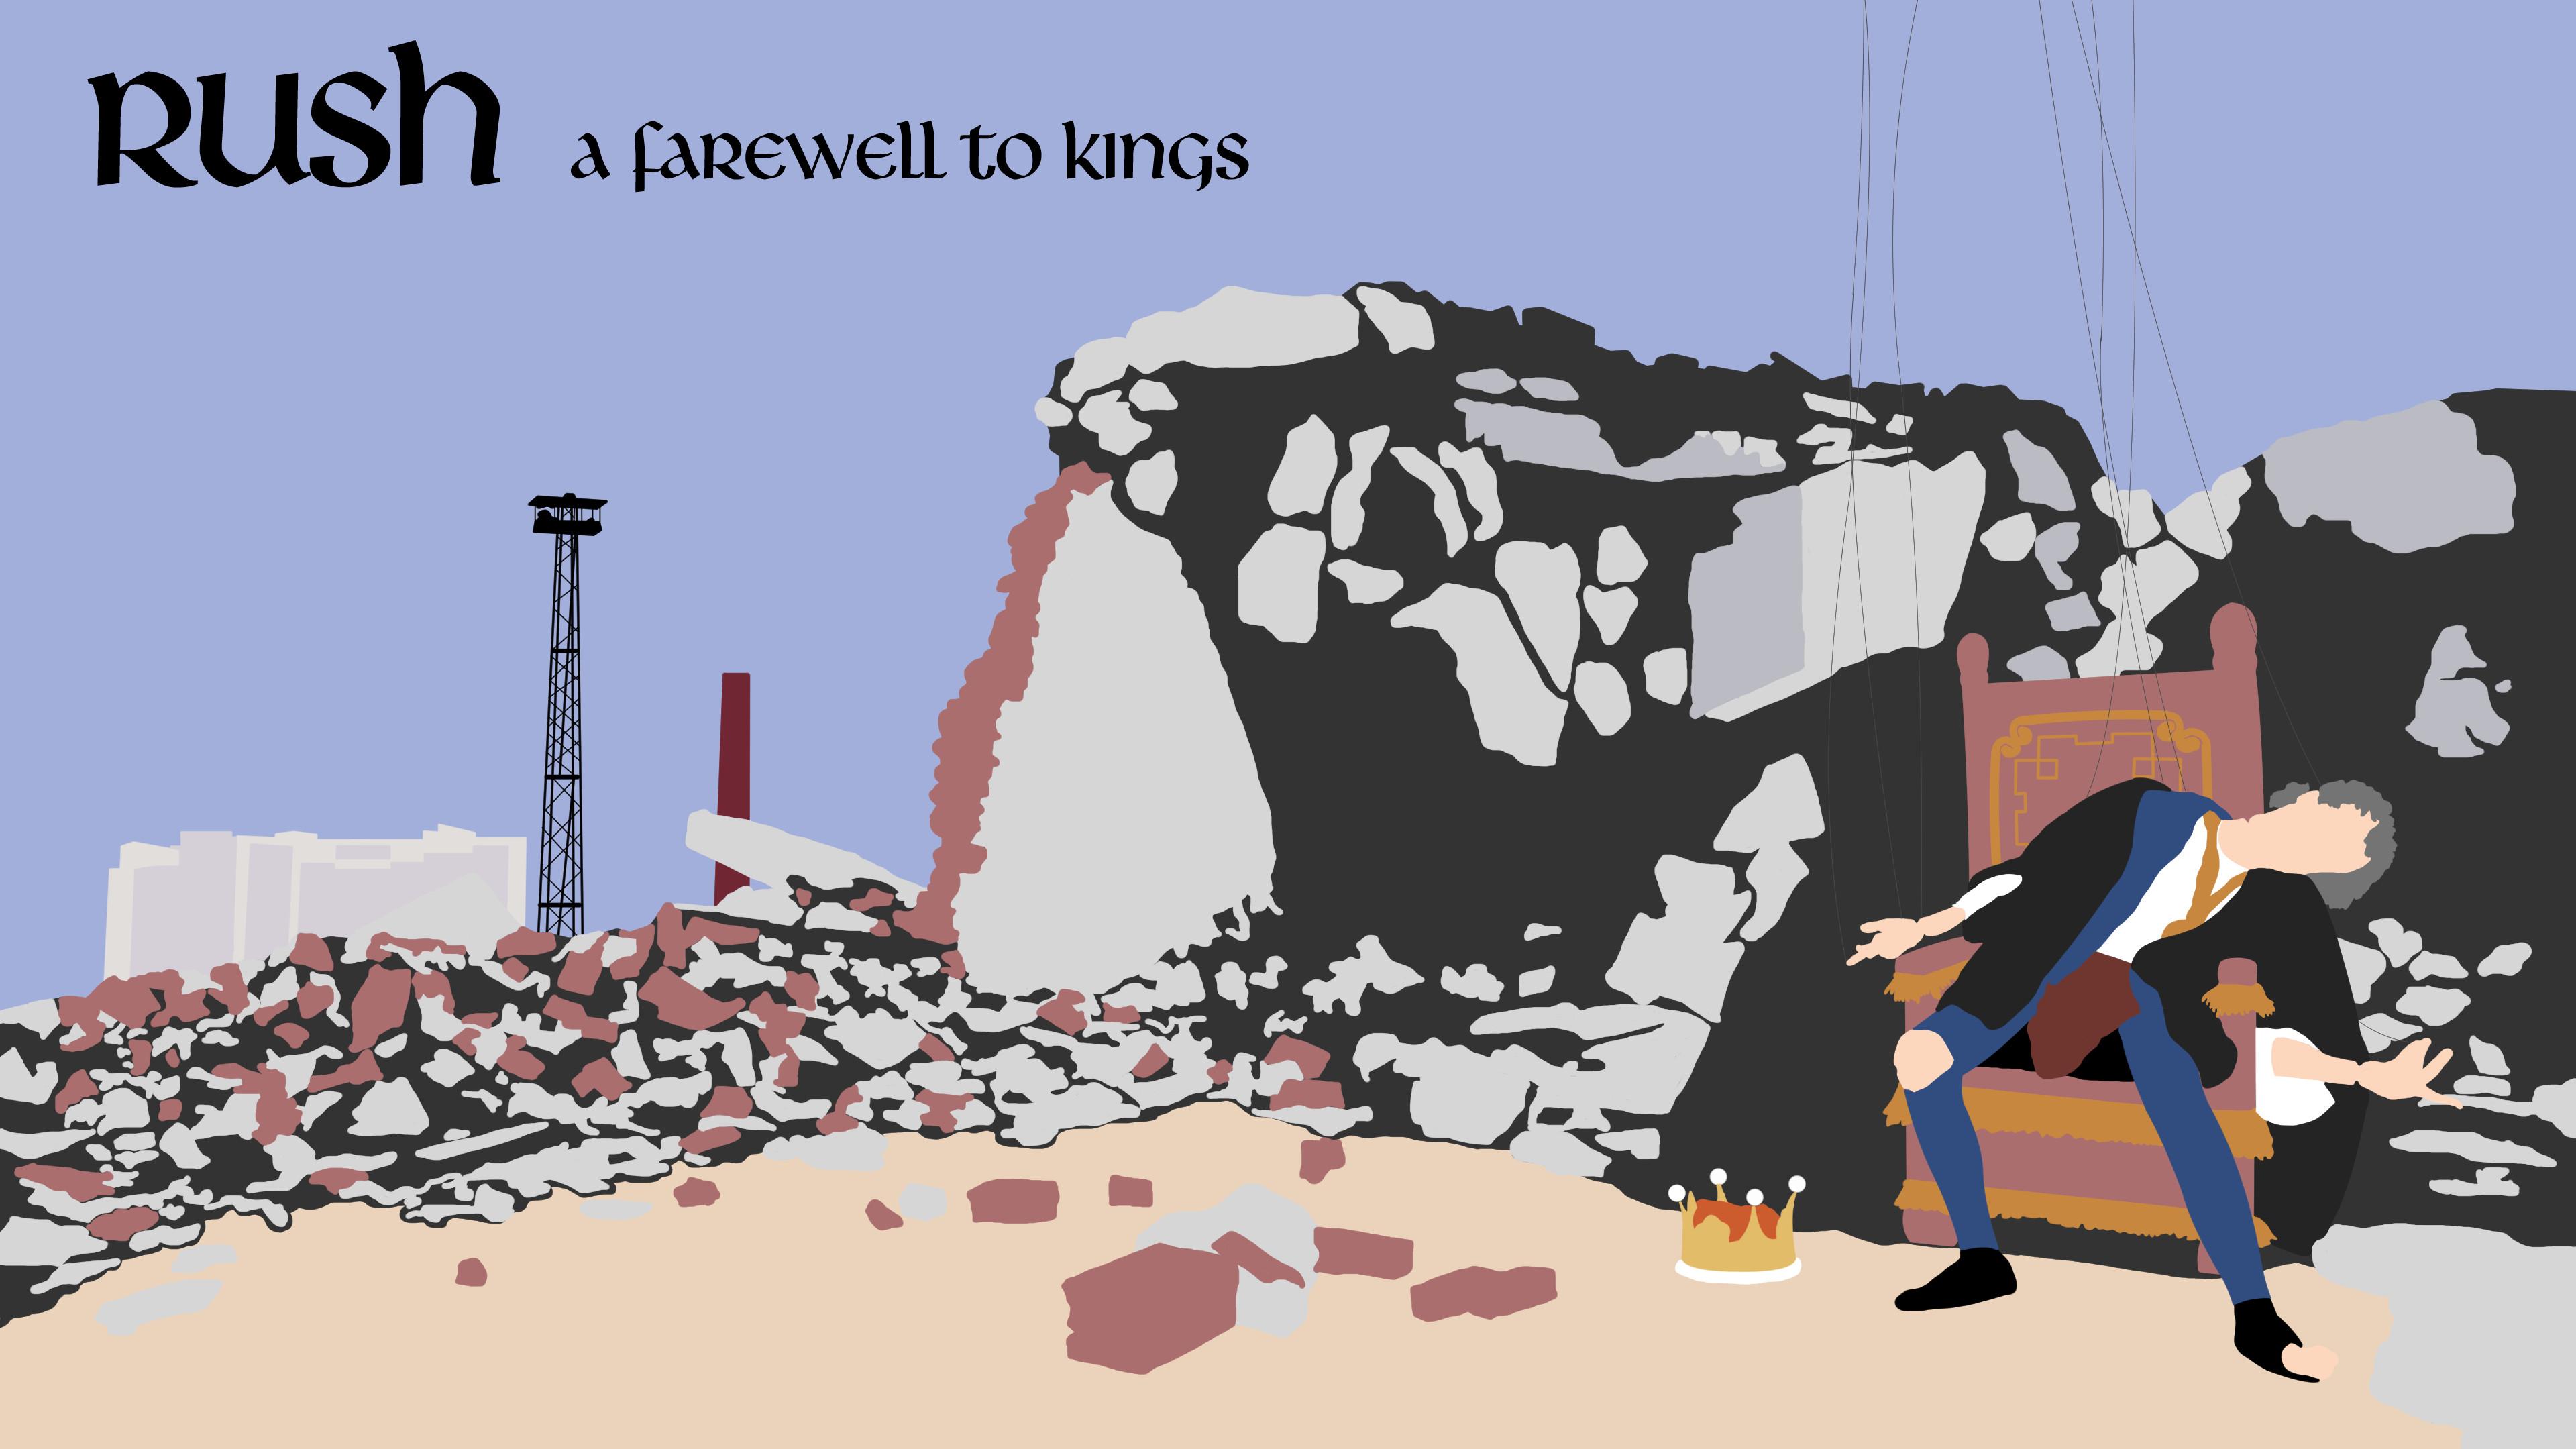 Fall Wallpaper Cartoon Download Free Rush Band Backgrounds Pixelstalk Net